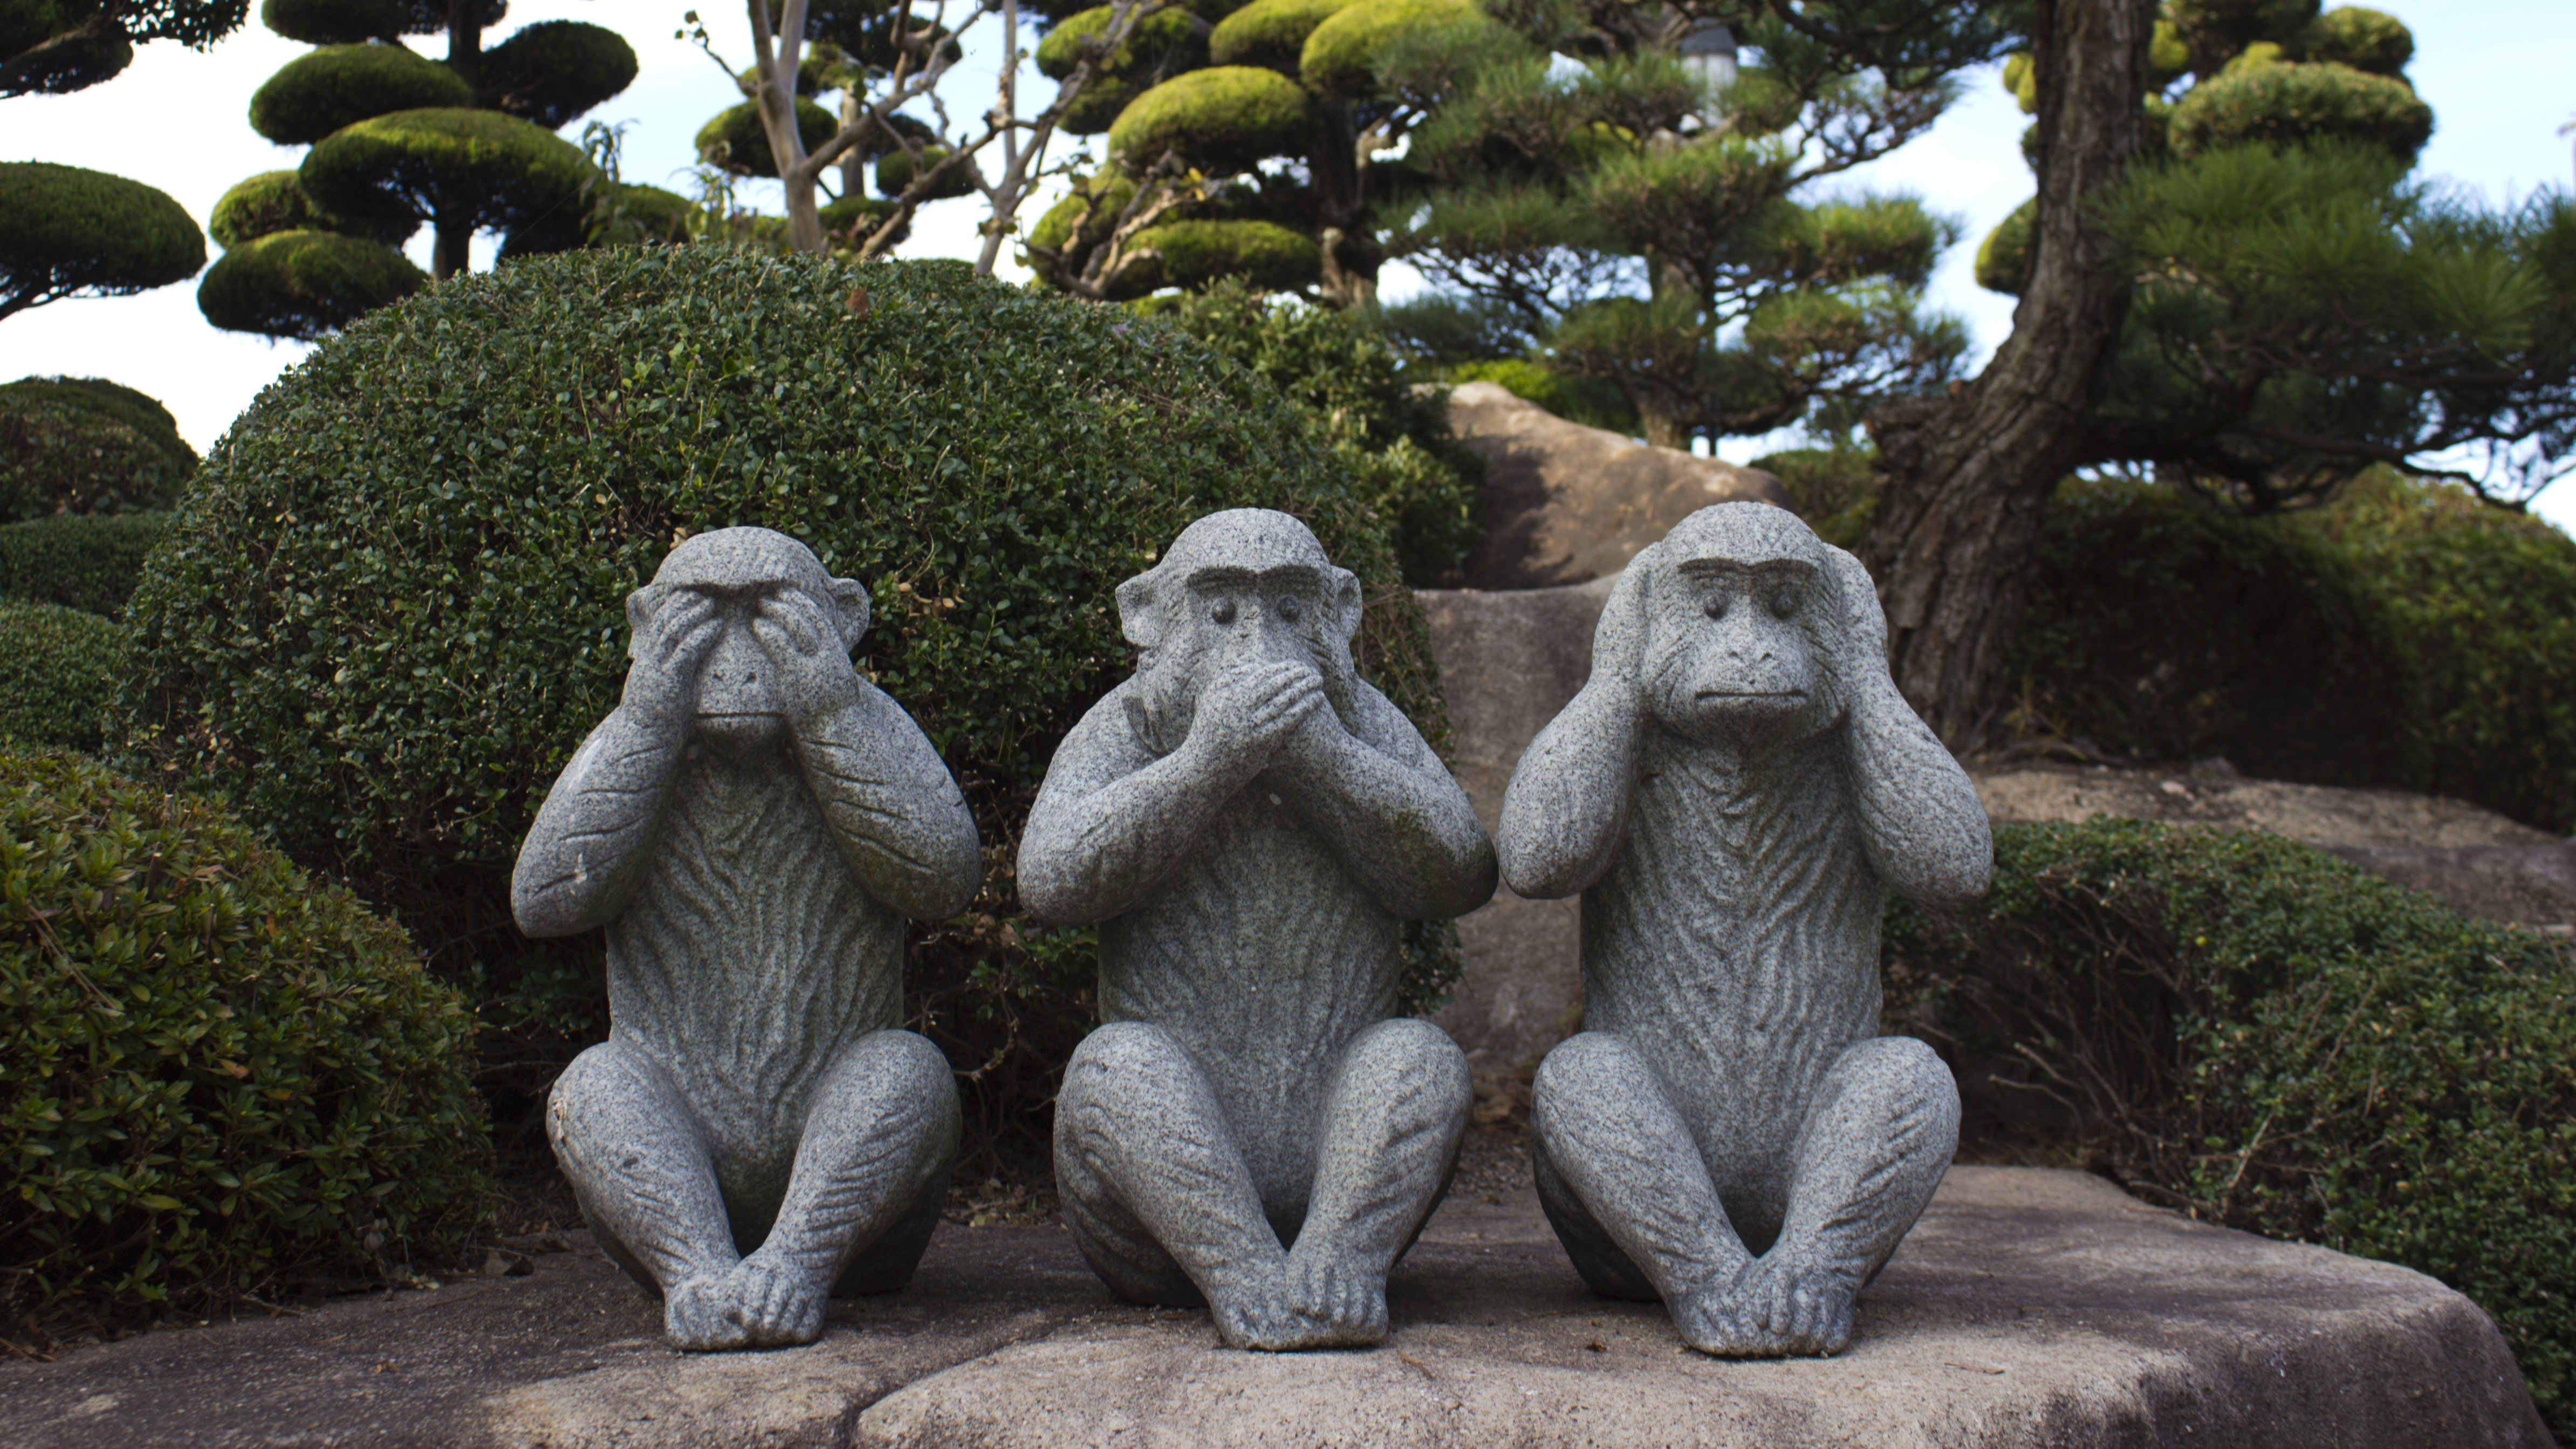 Kipovi tri mudra majmuna na japanskom otoku Inošima. Izvor: https://www.flickr.com/photos/68532869@N08/